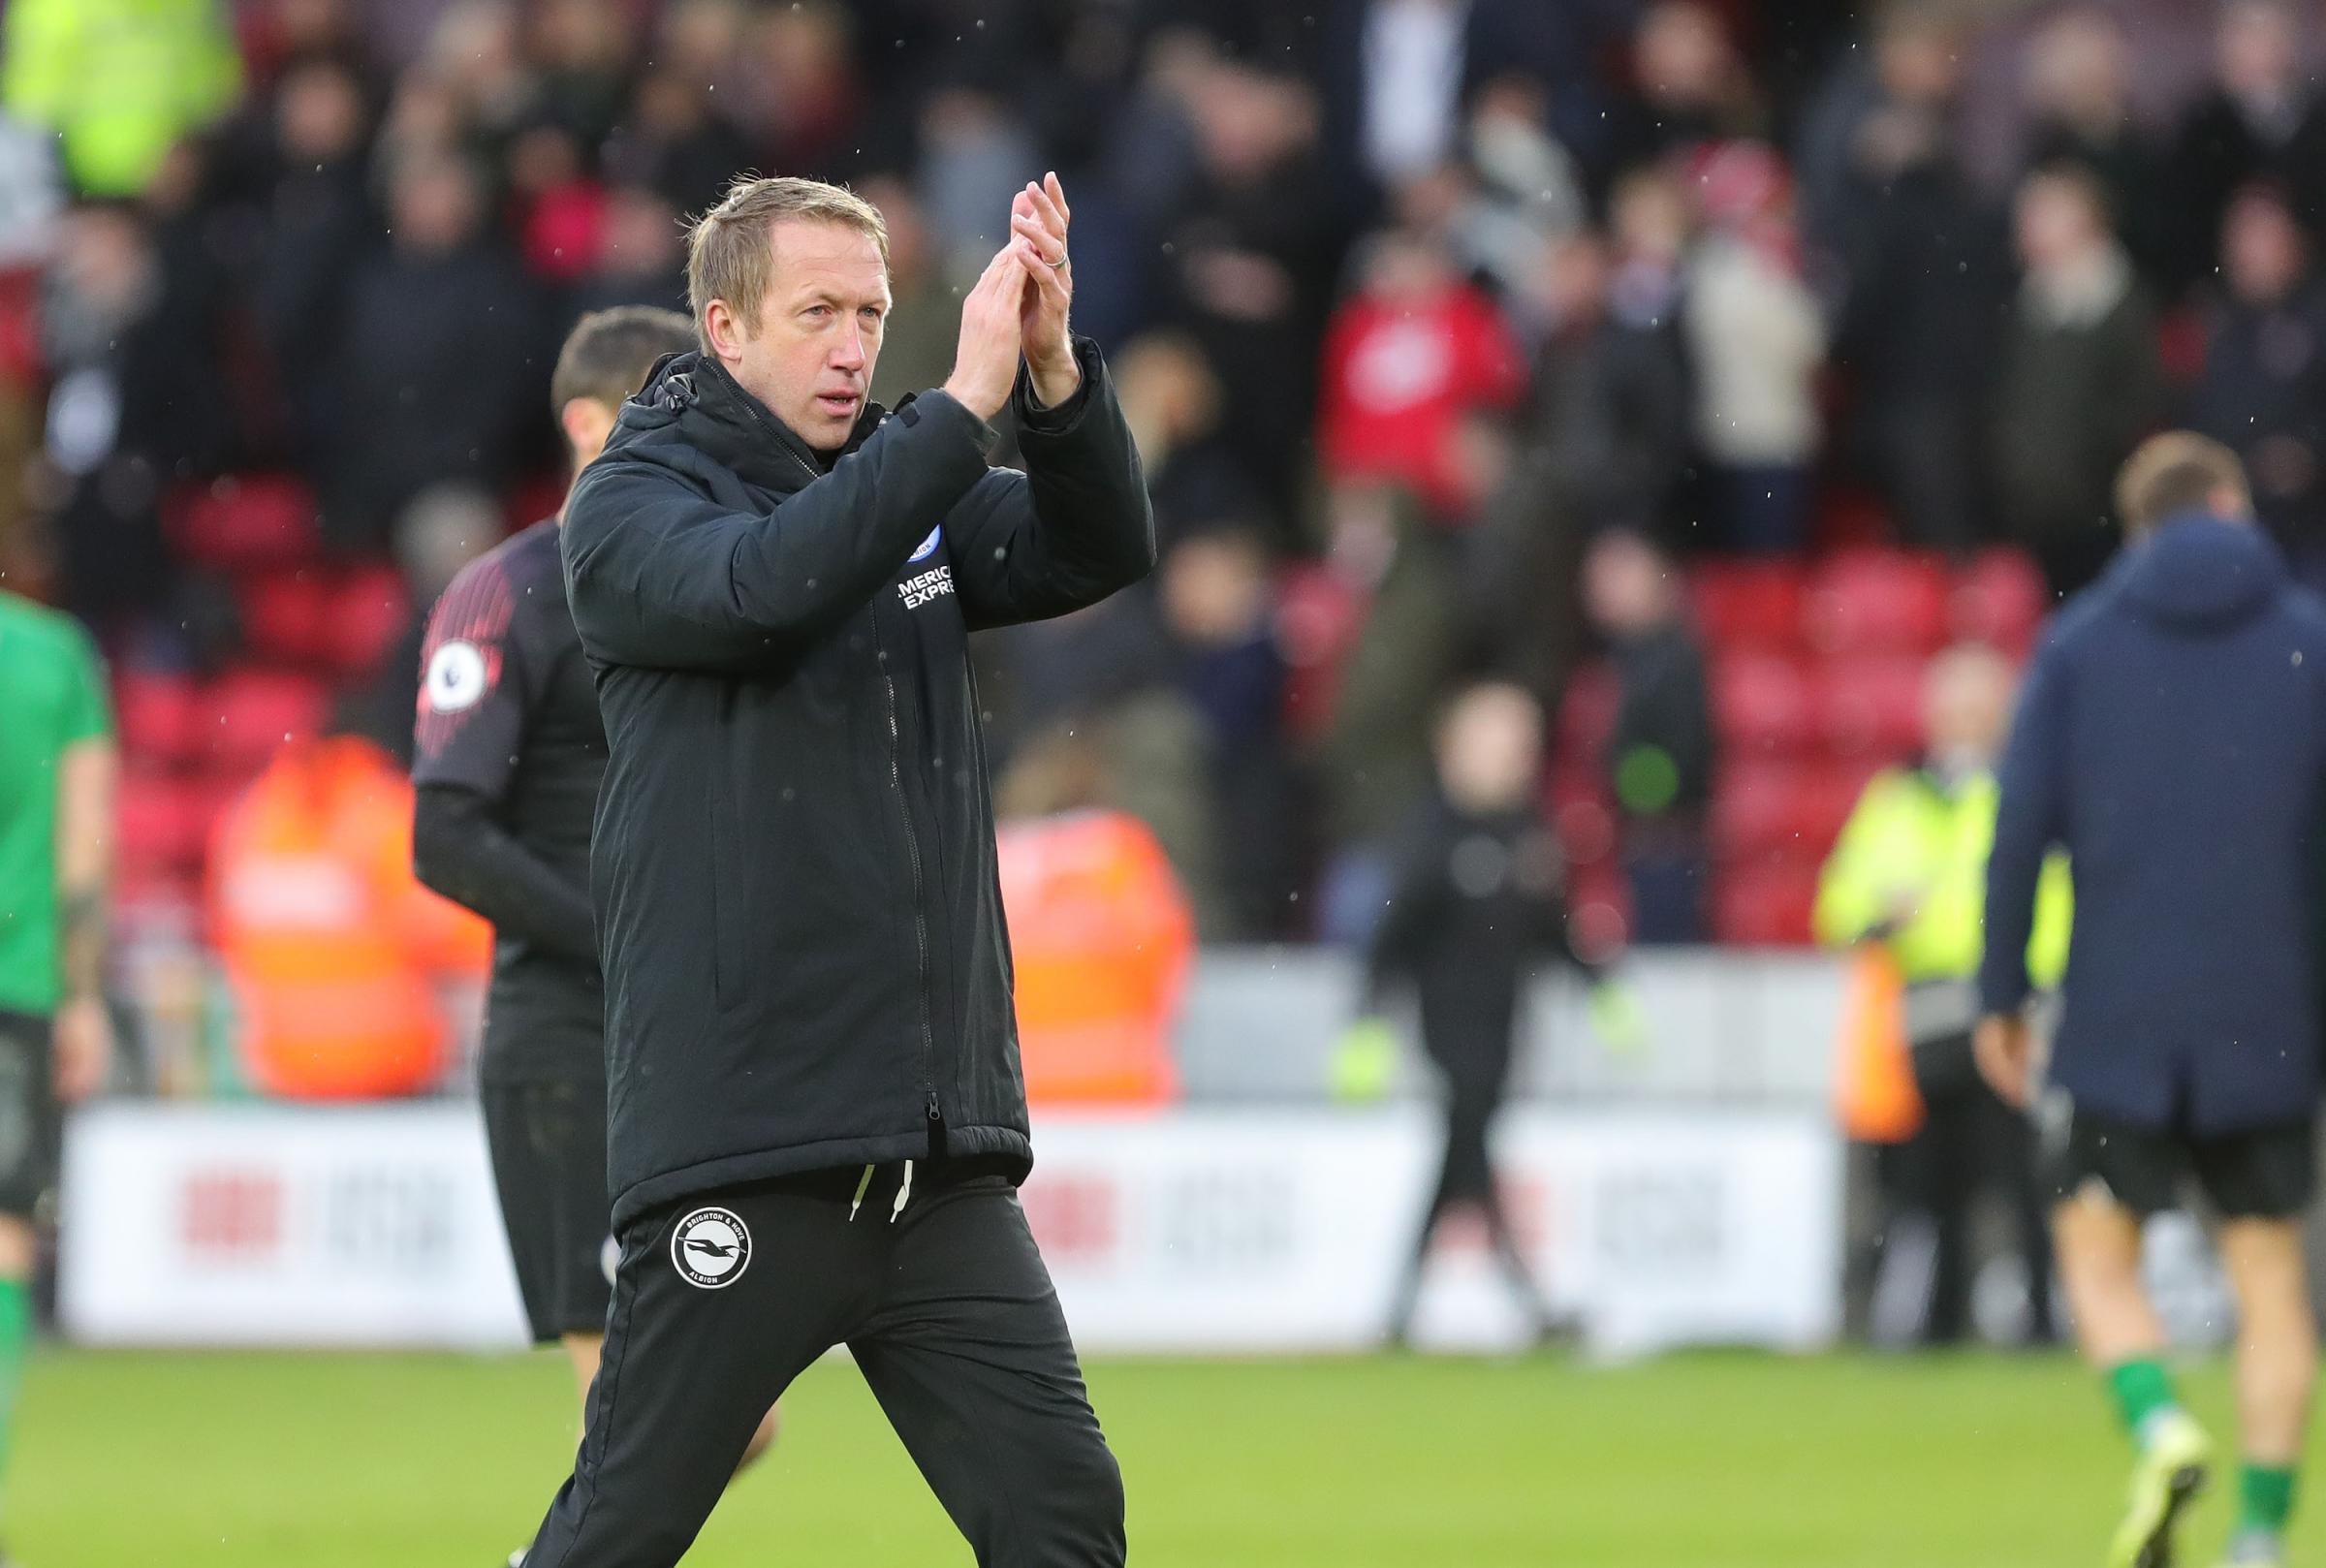 Graham Potter hopes for return of fans to Premier League